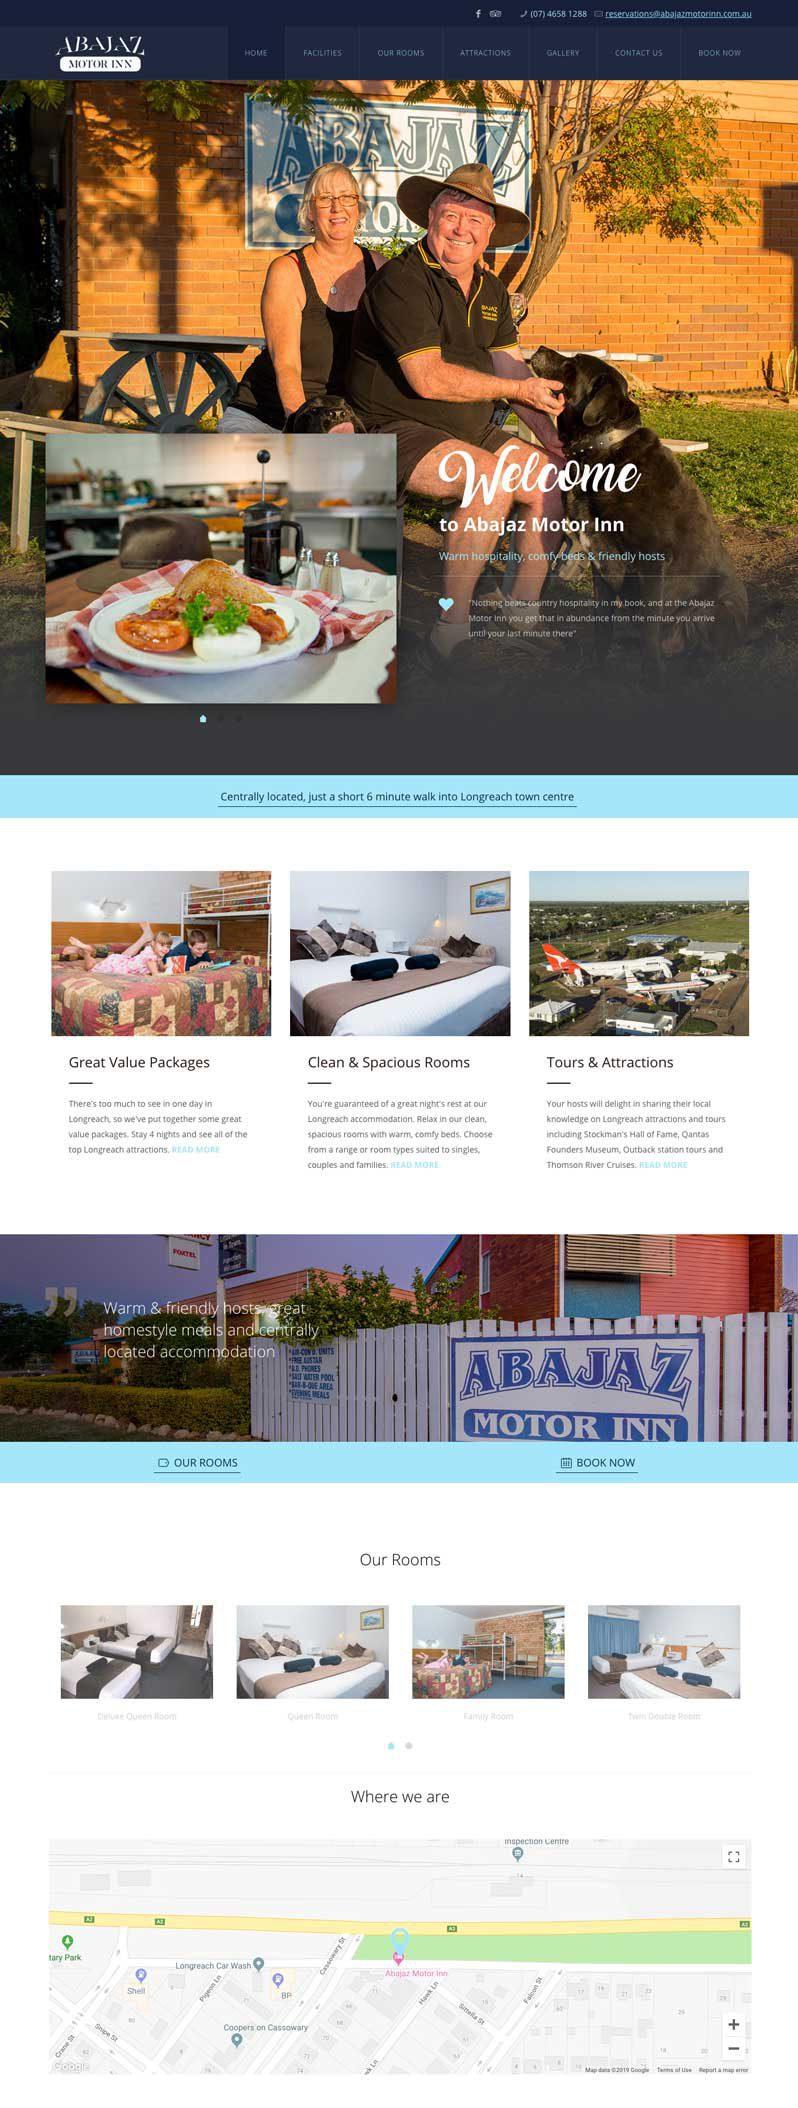 Abajaz Motor Inn website design